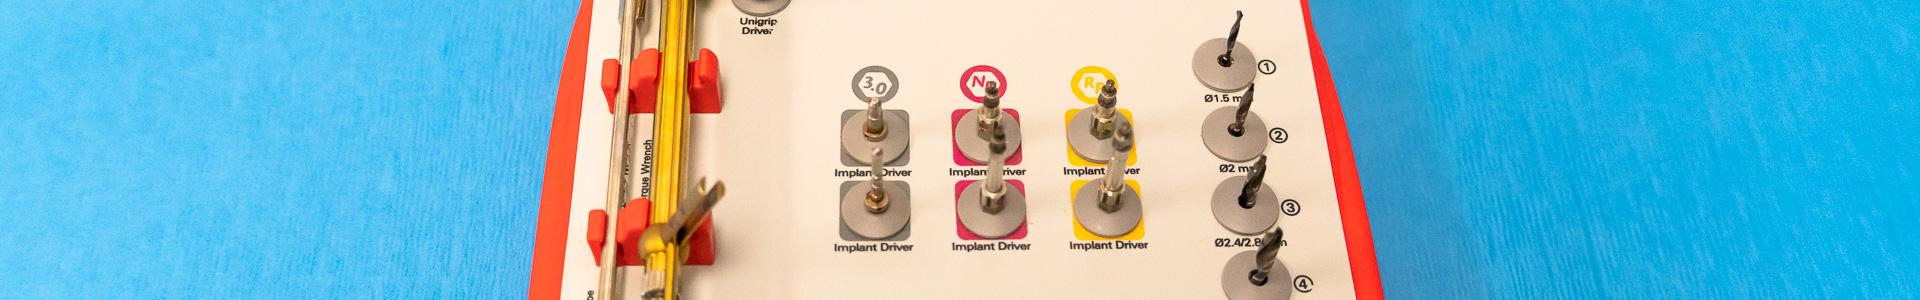 CVOS implant options-1